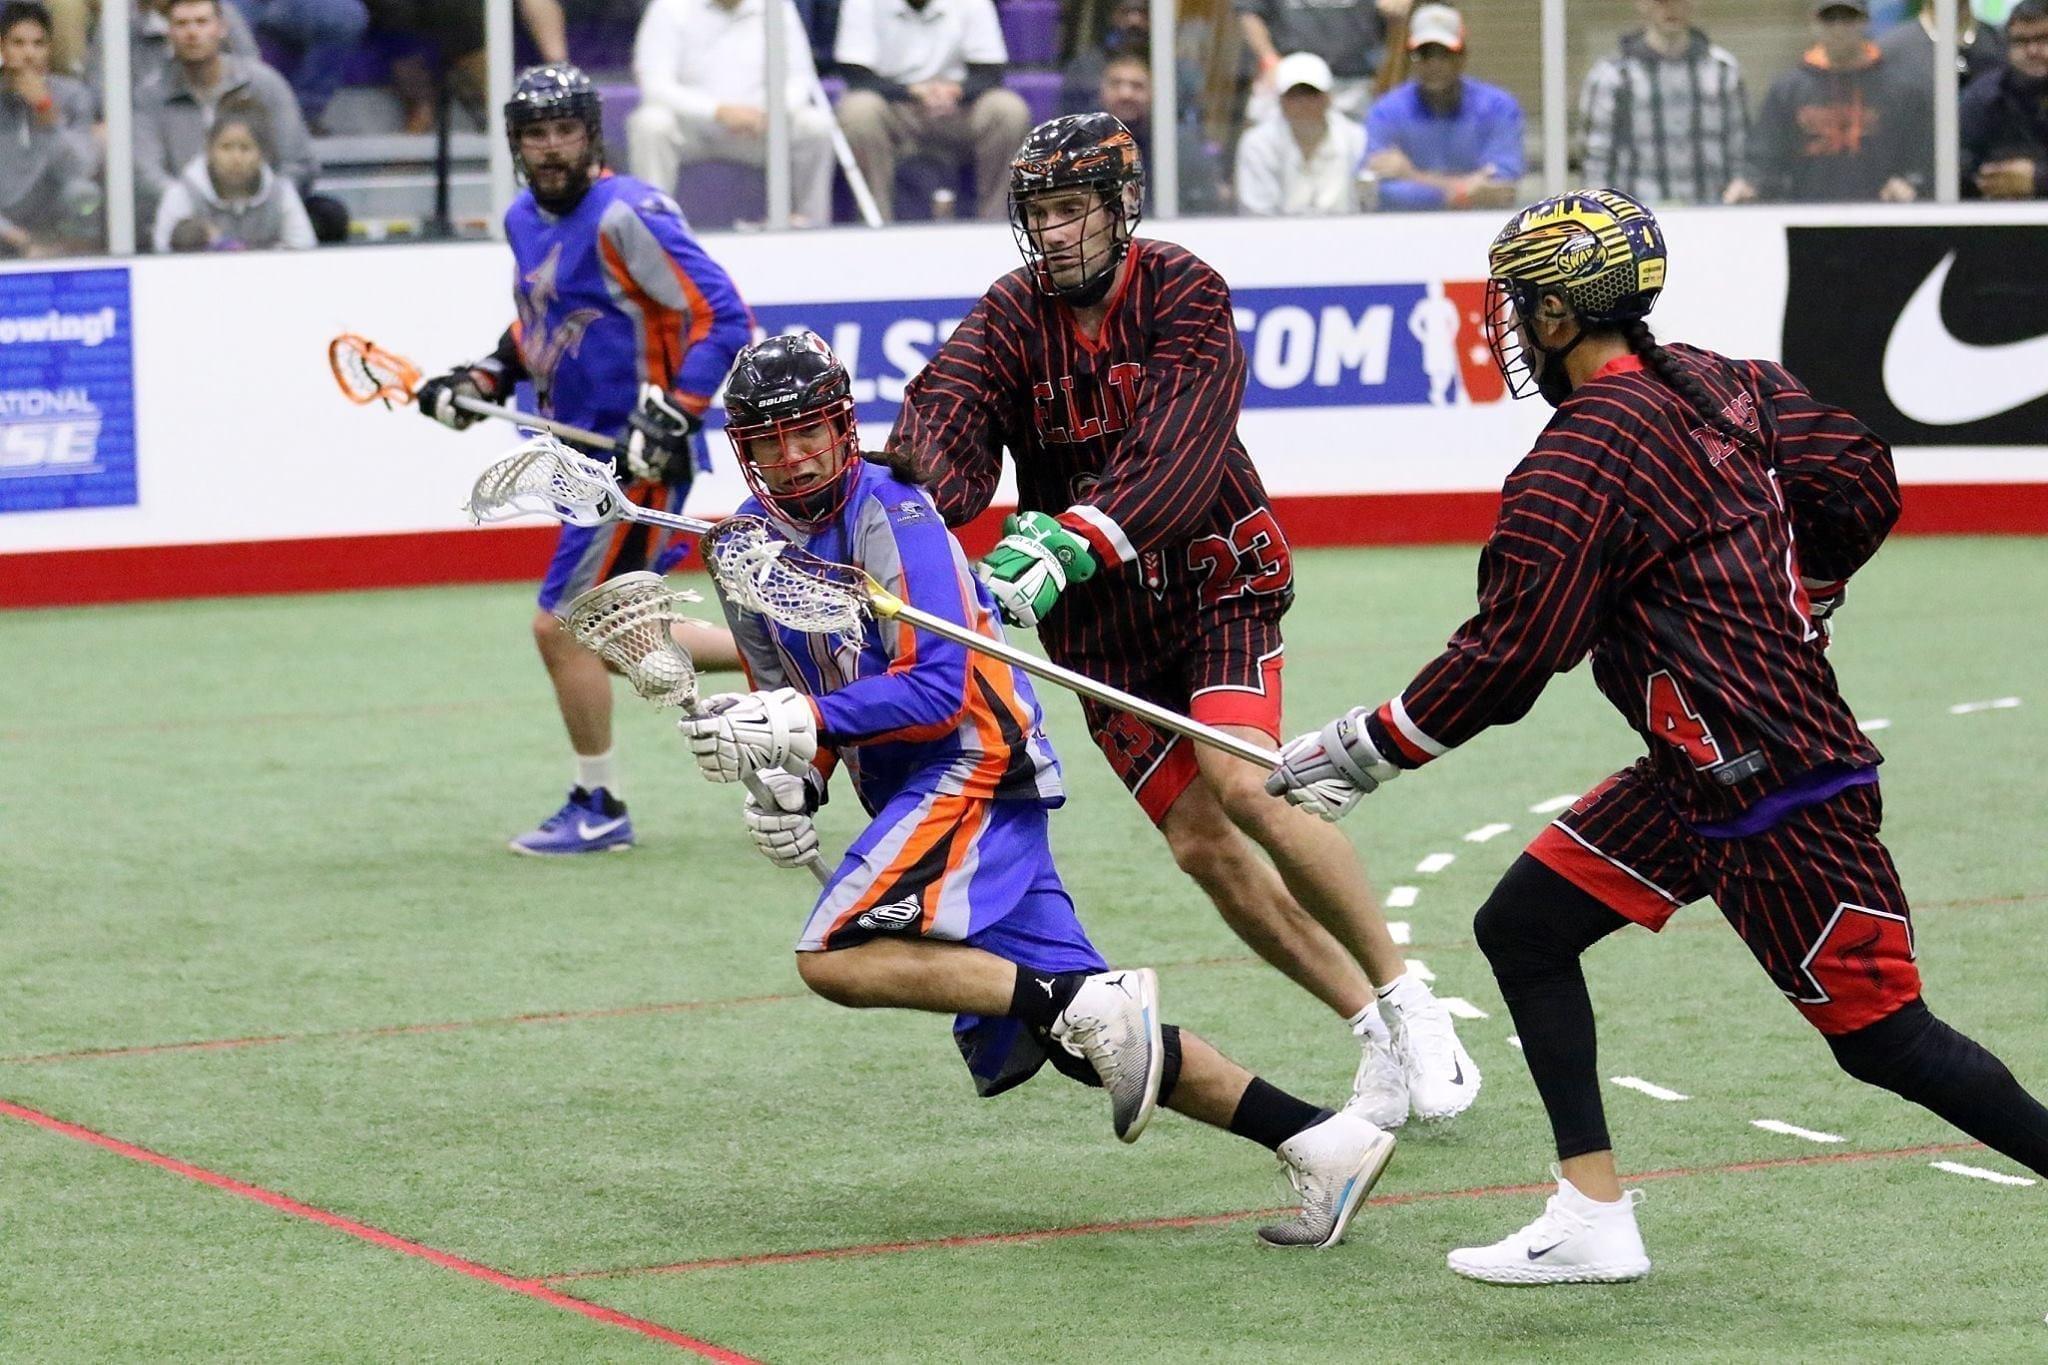 LASNAI 2017 LaxAllStars North American Invitational box lacrosse Onondaga Nation Cleveland Demons Thompson Brothers Lacrosse photo: Jeff Melnik